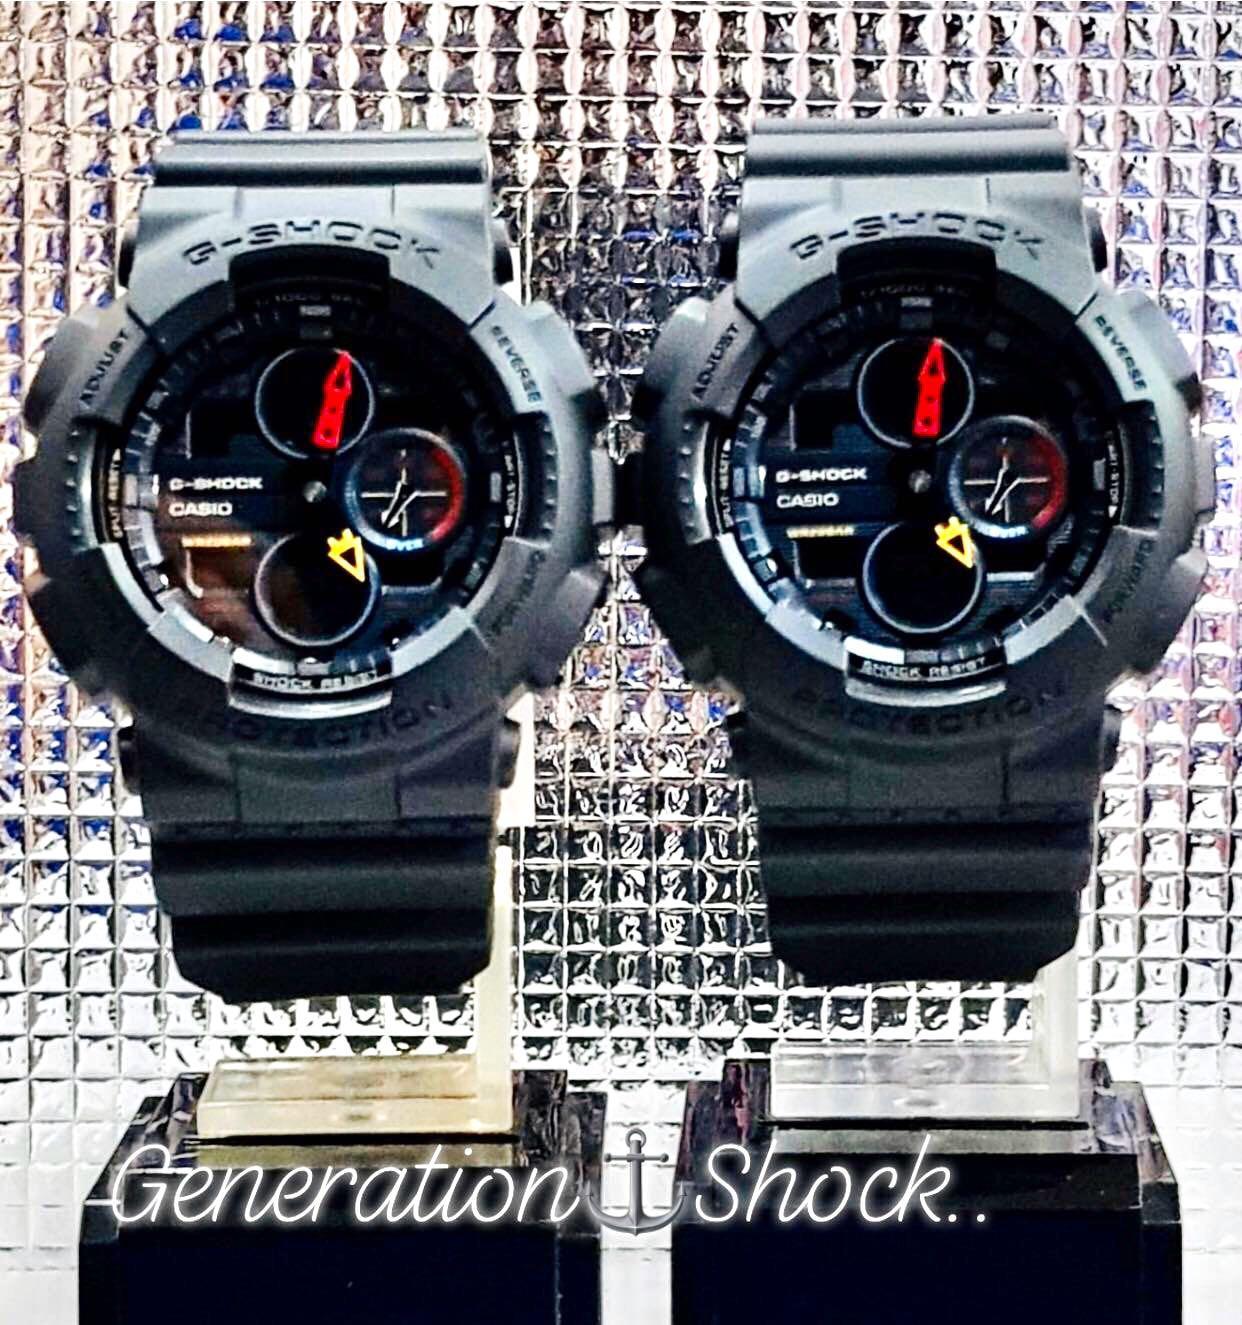 NEW💝COUPLE SET :  GSHOCK UNISEX DIVER SPORTS WATCH : 100% ORIGINAL AUTHENTIC CASIO G-SHOCK : GA-140BMC-1ADR / GA-140BMC-1A / GA-140-BMC-1A / GA-100-1A new series (DEEP-BLACK)